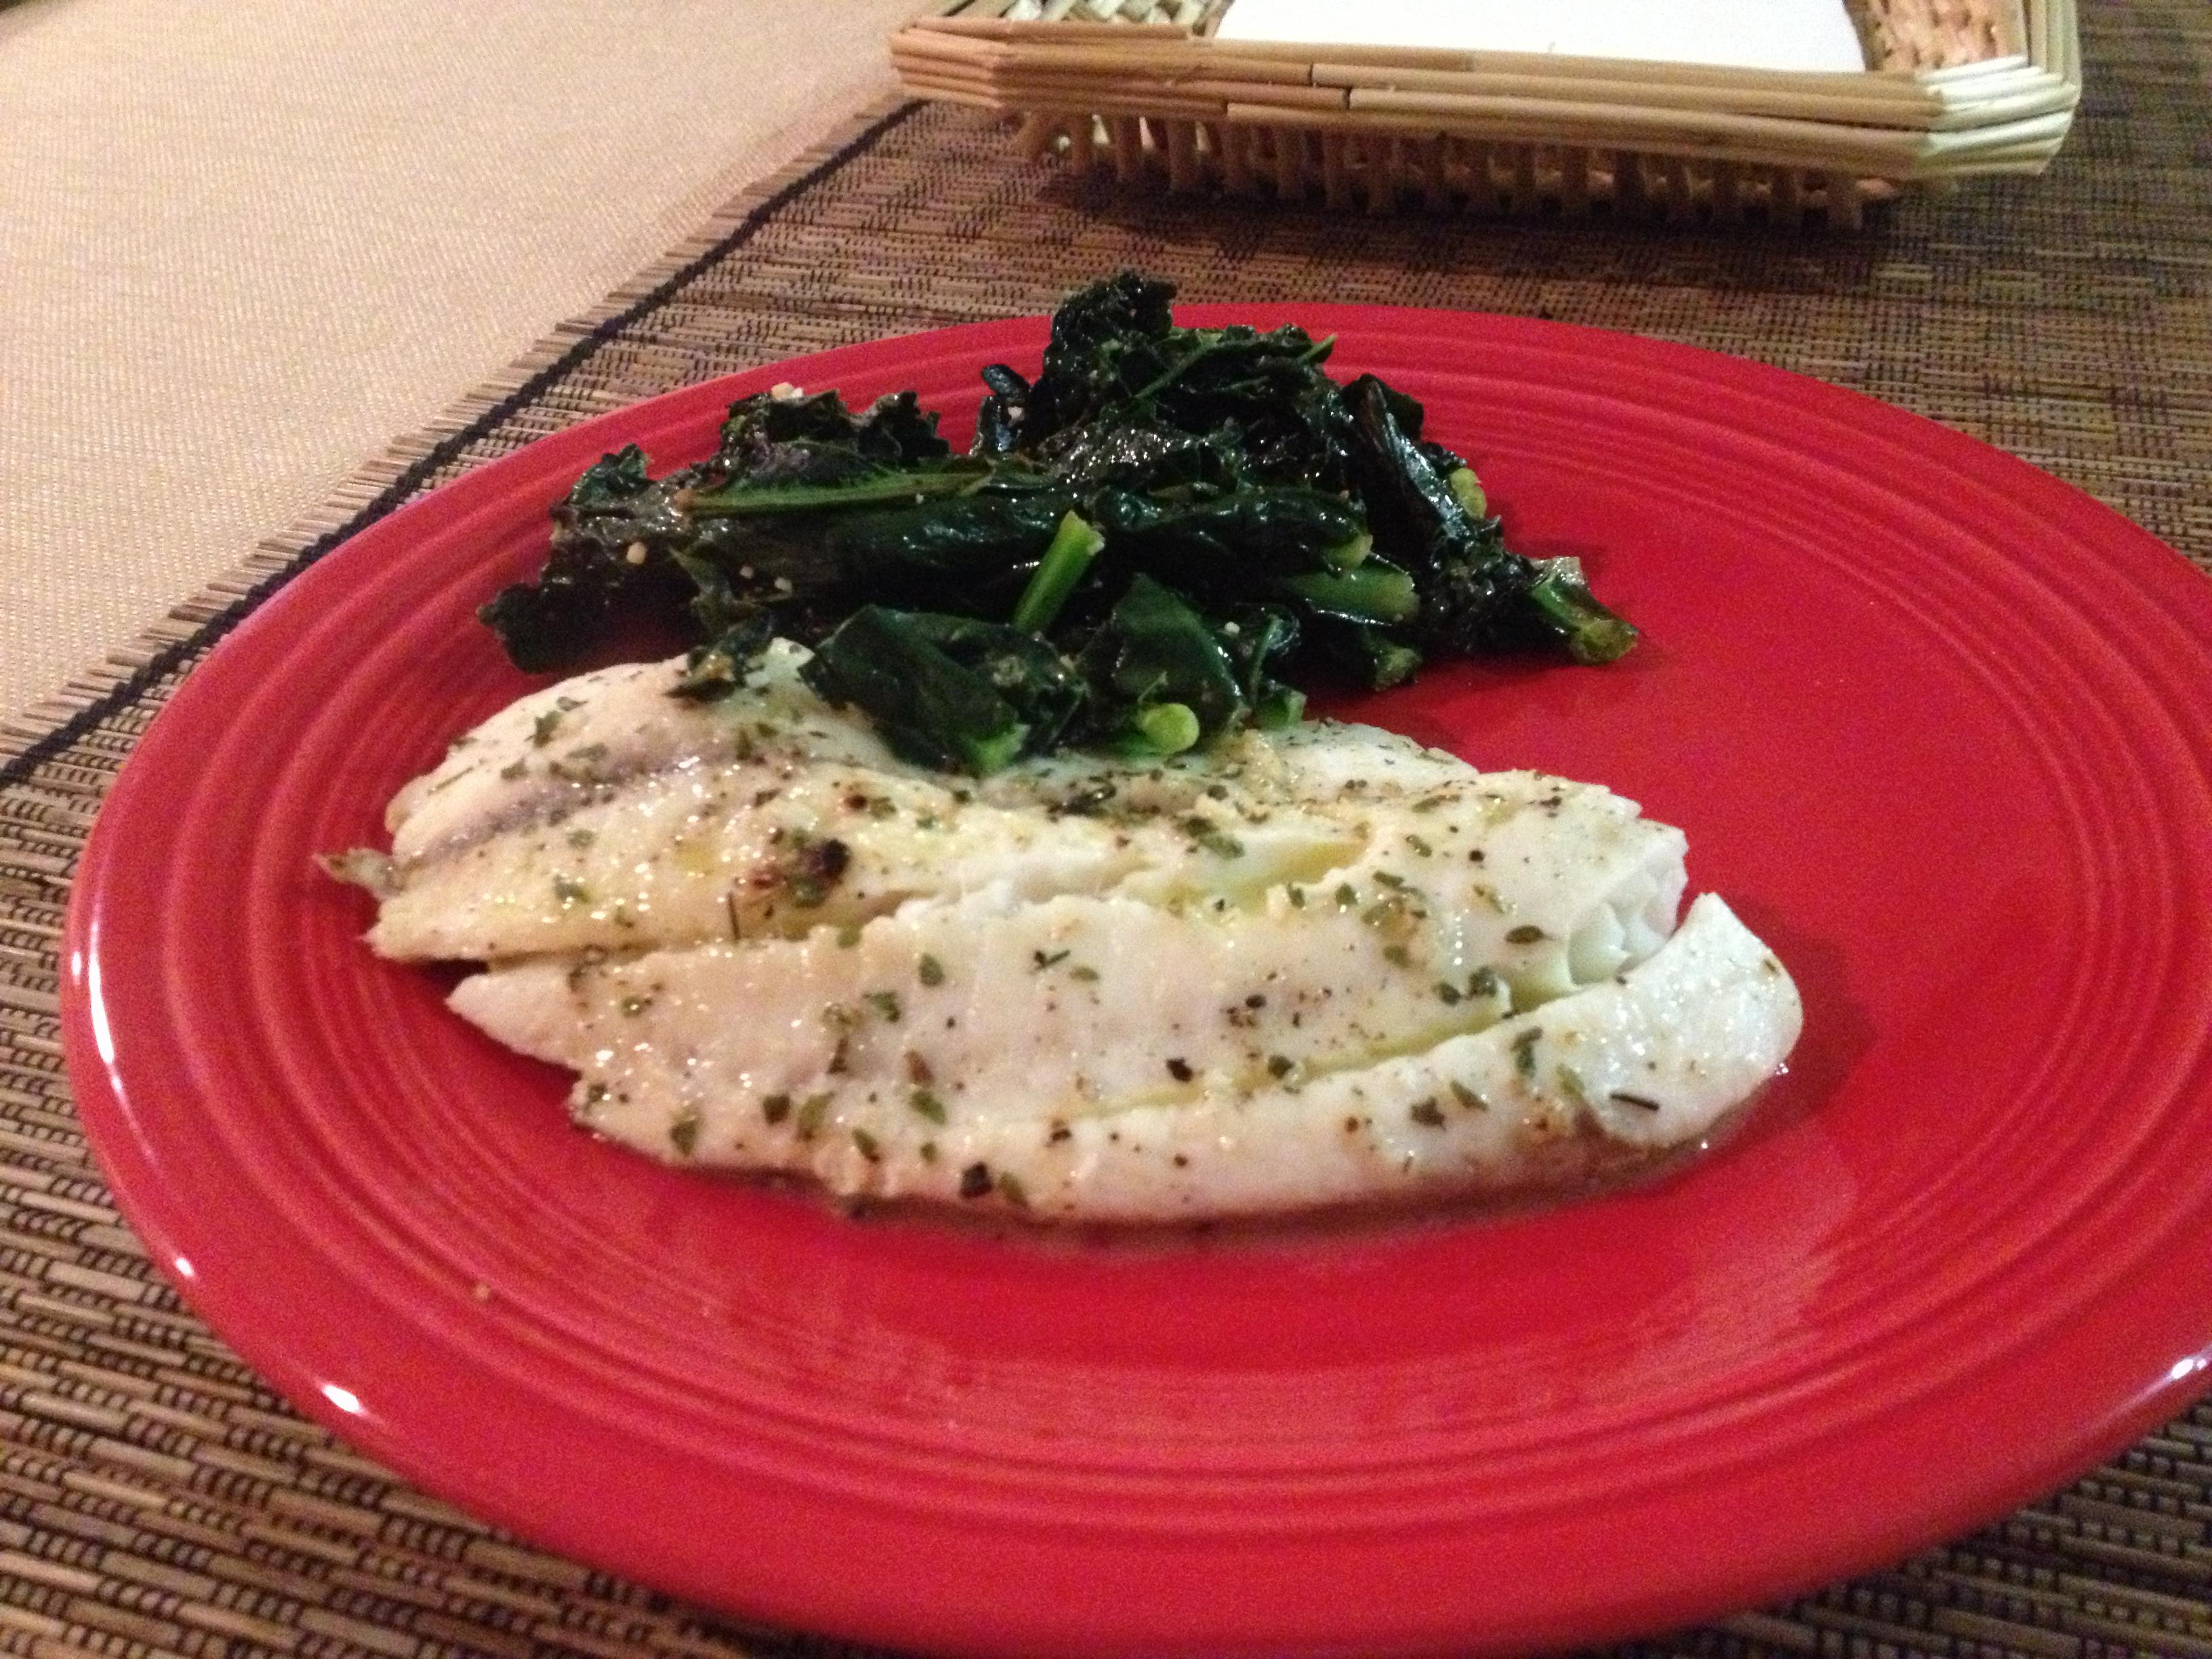 Tilapia, kale, paleo recipes, paleo blog